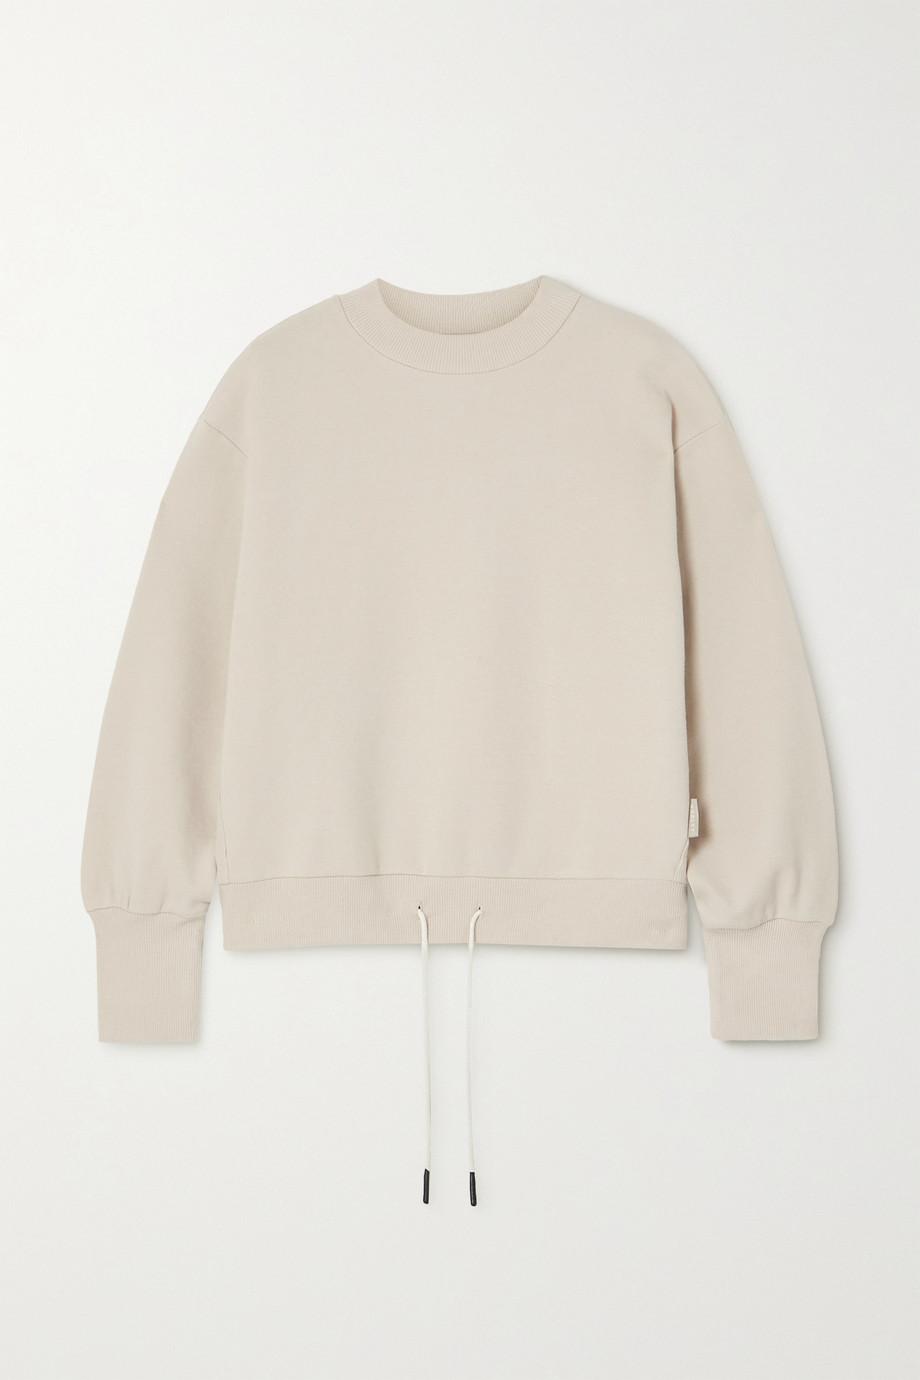 Varley Edith stretch-cotton piqué sweatshirt